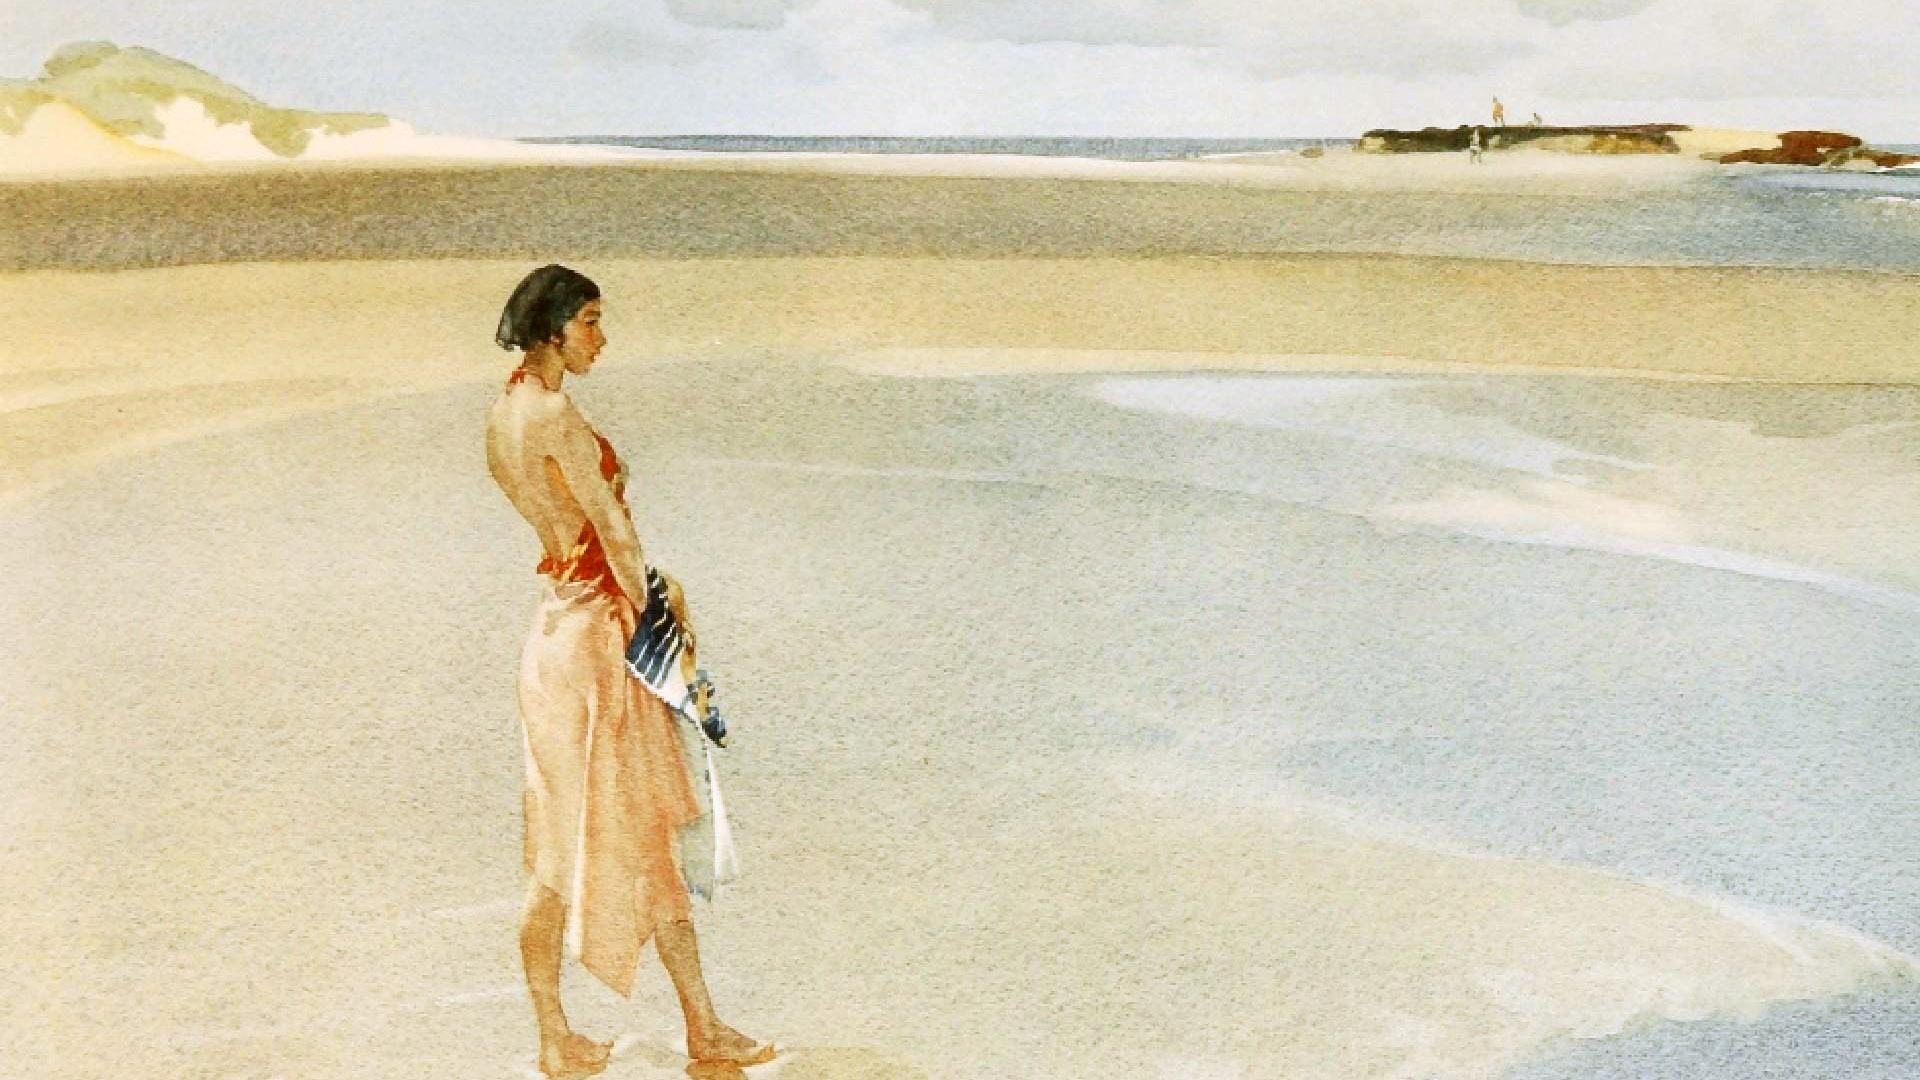 William Russell Flint - Far Horizon 1920x1080